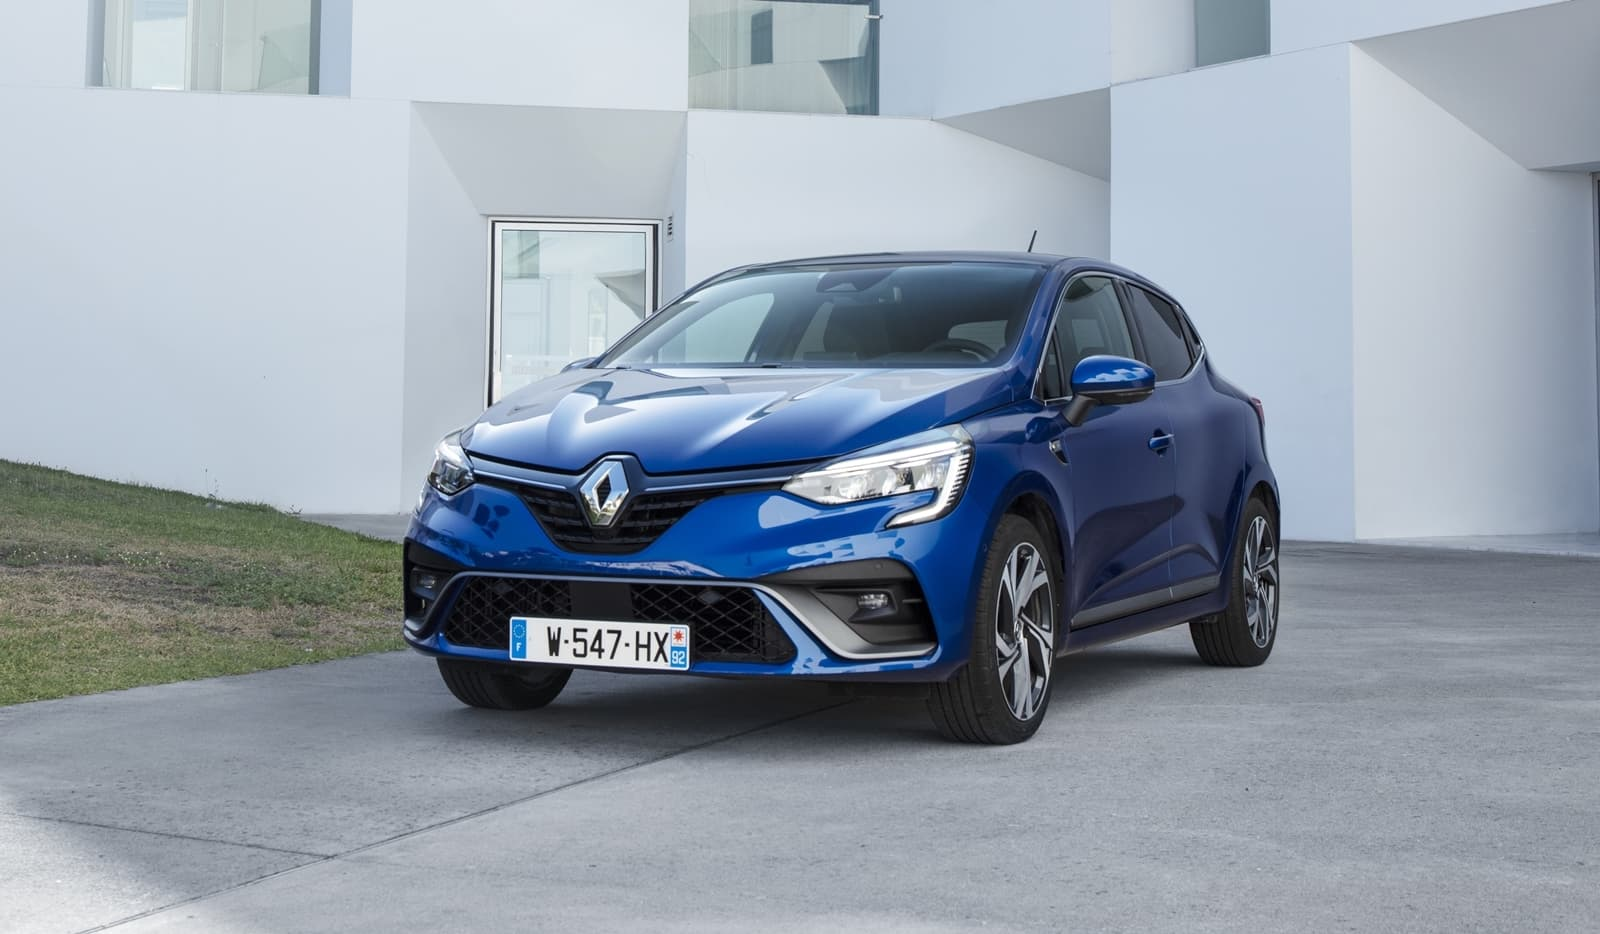 Renault Clio 2020 Prueba 0619 034